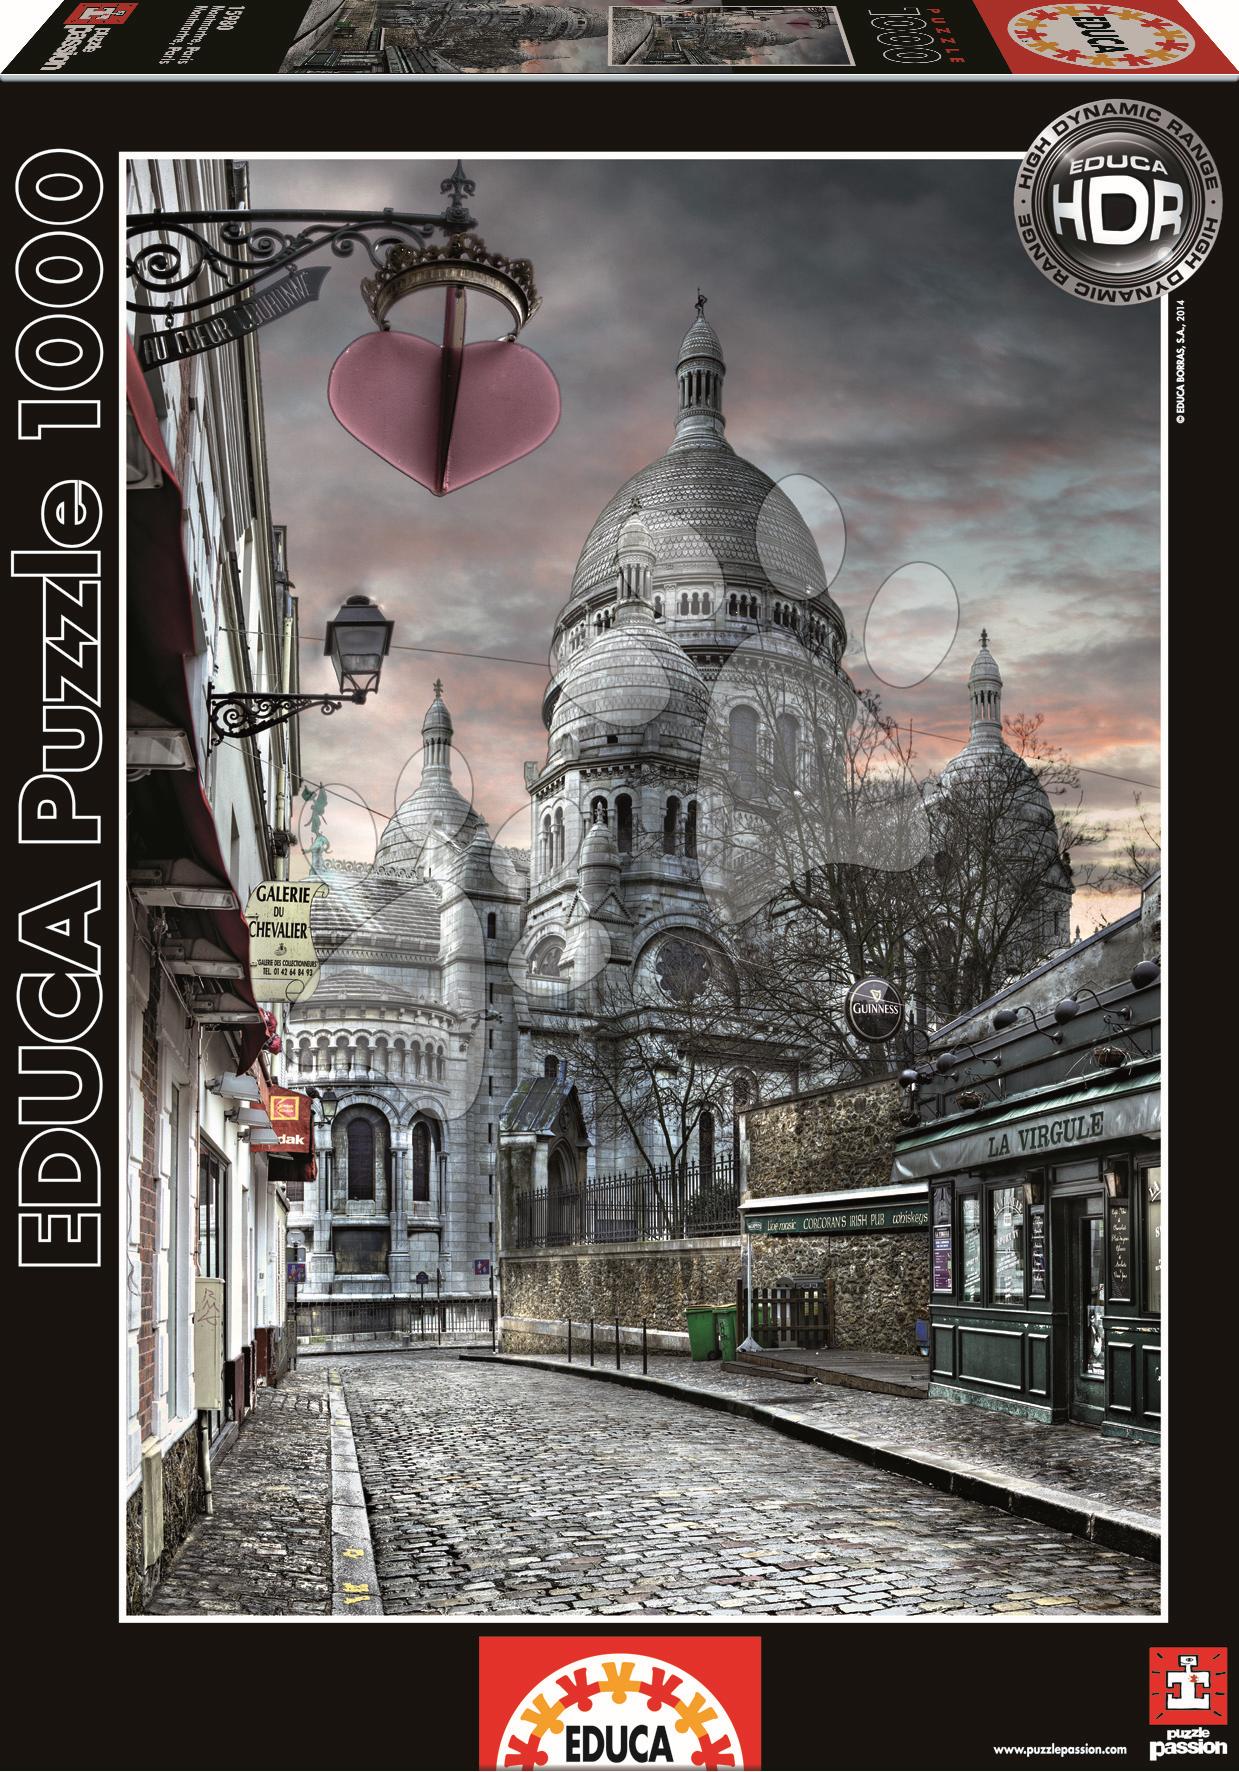 Puzzle 1000 dielne - Puzzle Genuine Montmartre Paris Educa 1000 dielov od 12 rokov